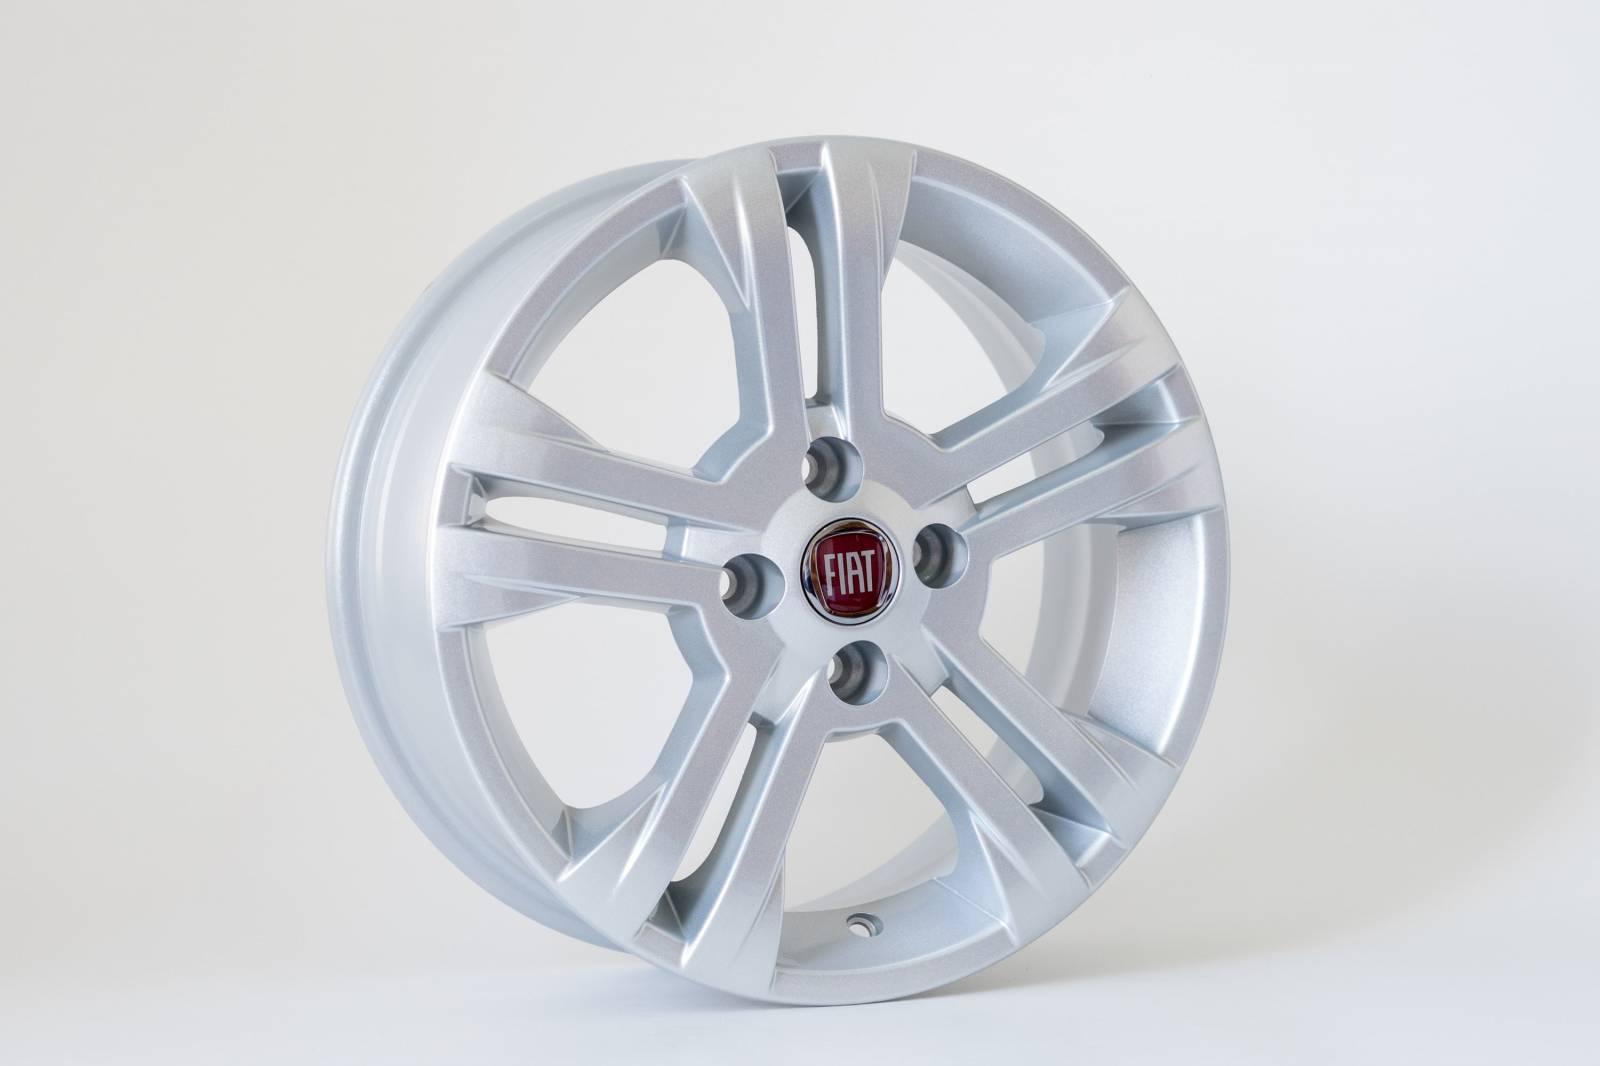 Jogo de 04 Rodas Fiat New Palio aro 14 4x98 KR R17 Prata